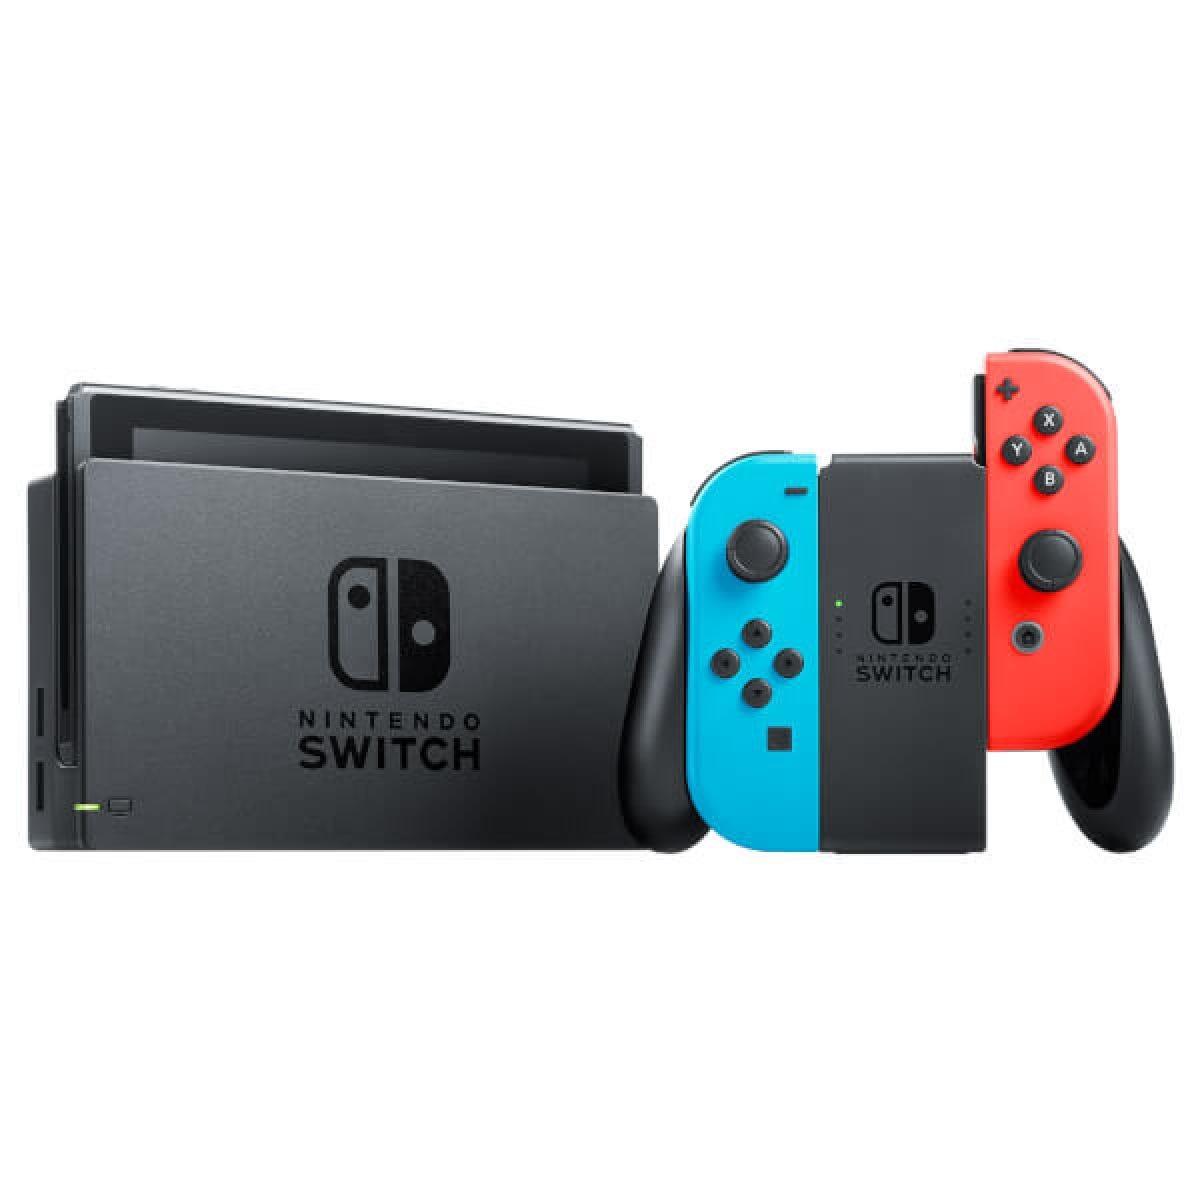 Nintendo Switch - Neon Red/Blue